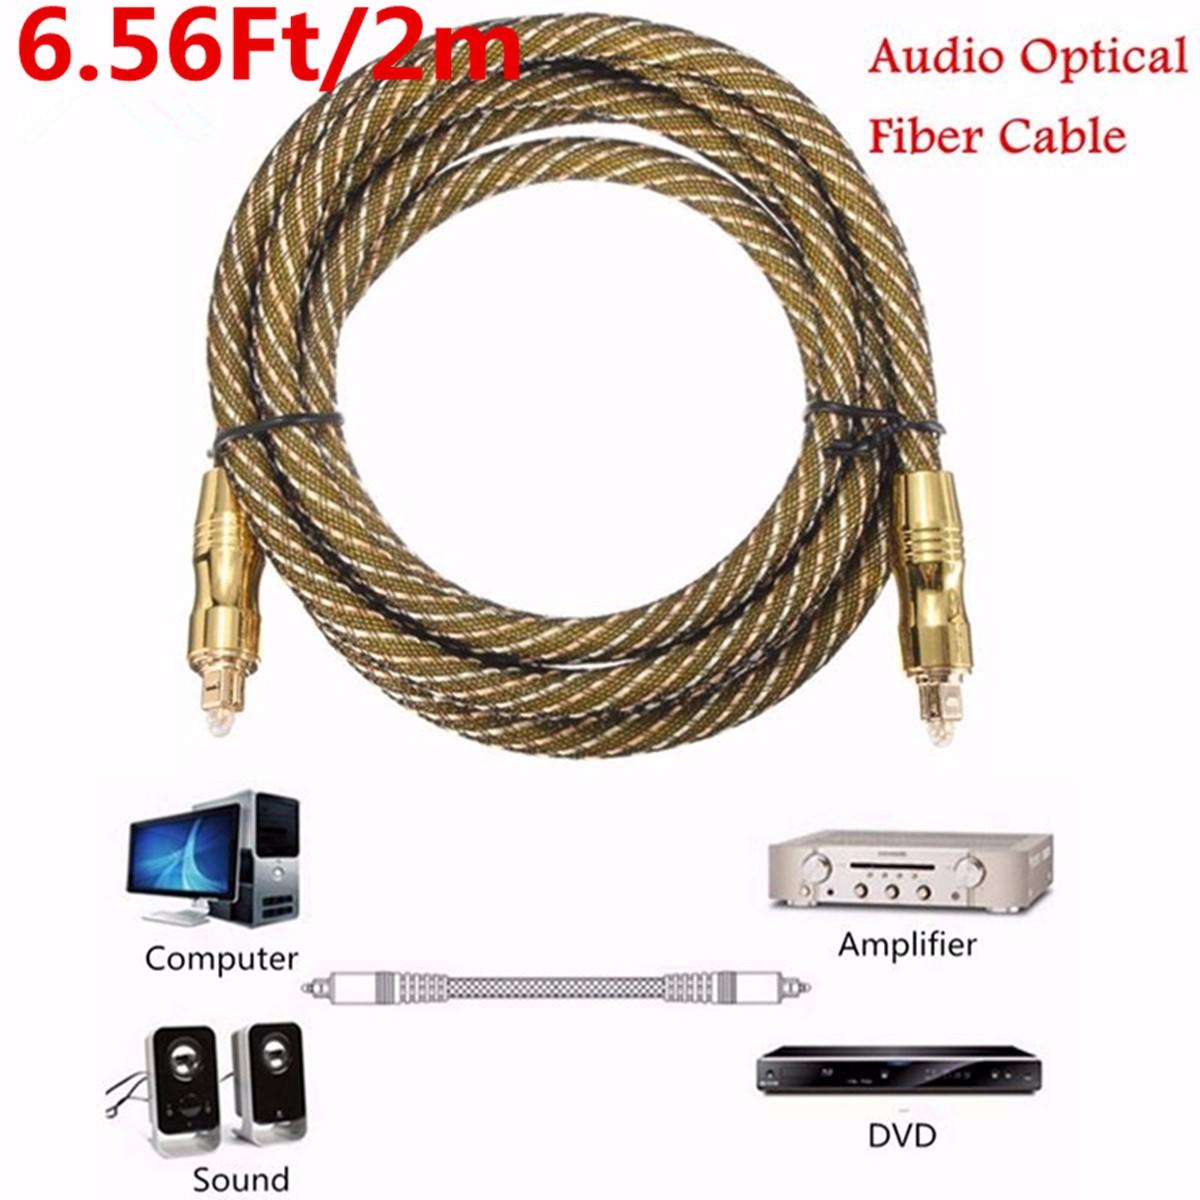 6.5ft Premium Toslink Fiber Optic Digital Audio Optical Cable S/PDIF Cord Wire Multi-Media Cord Wire